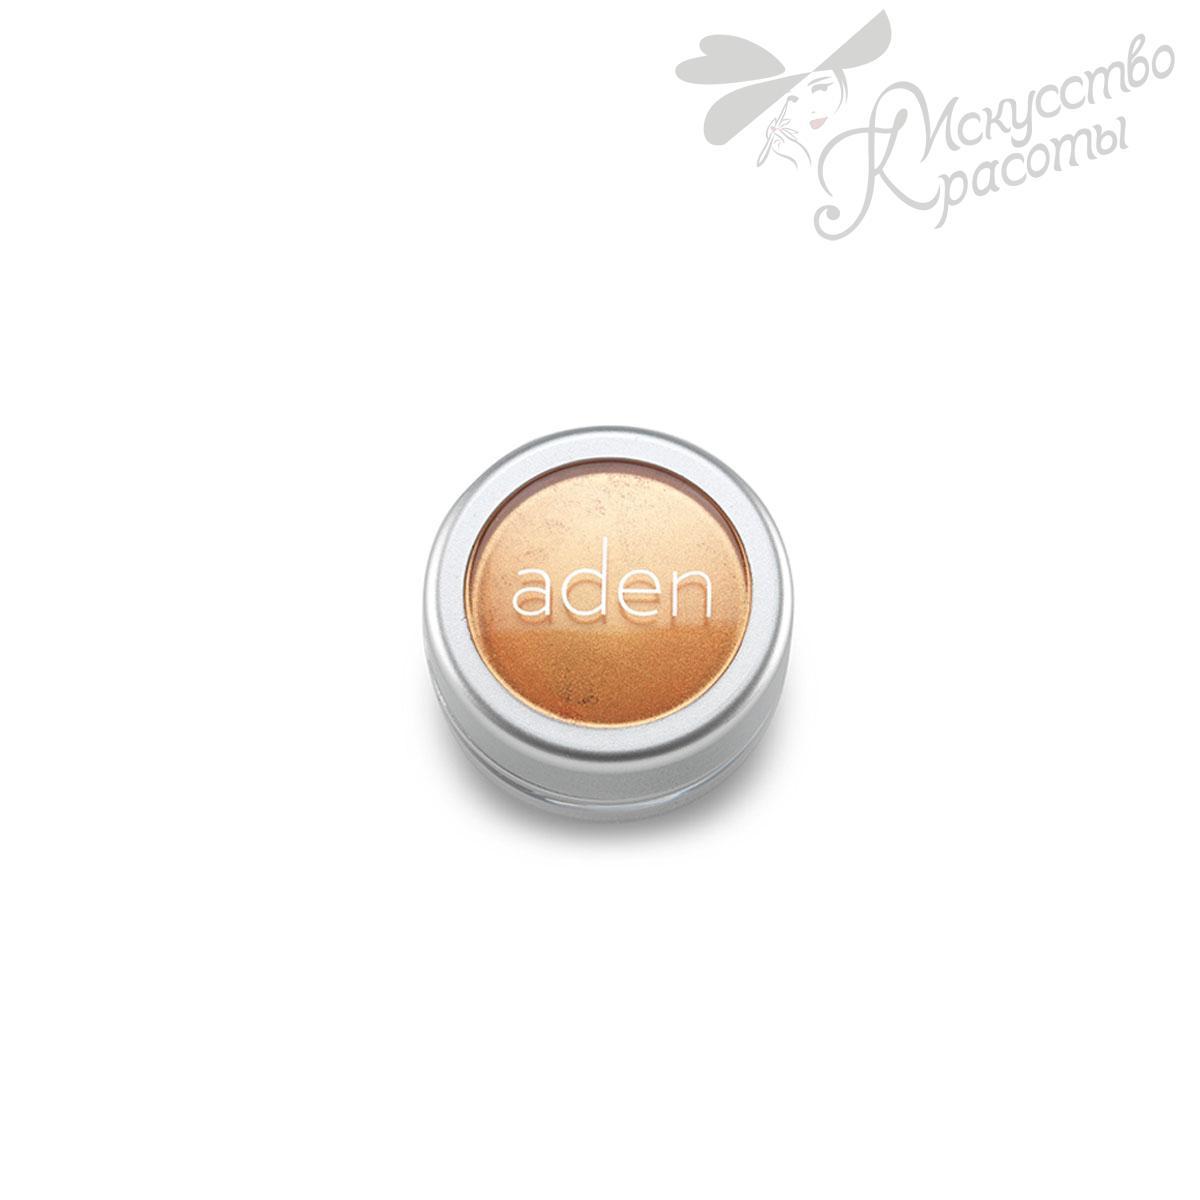 Тени для век Loose Powder Eyeshadow / Pigment Powder №13 Honour gold Aden 3г